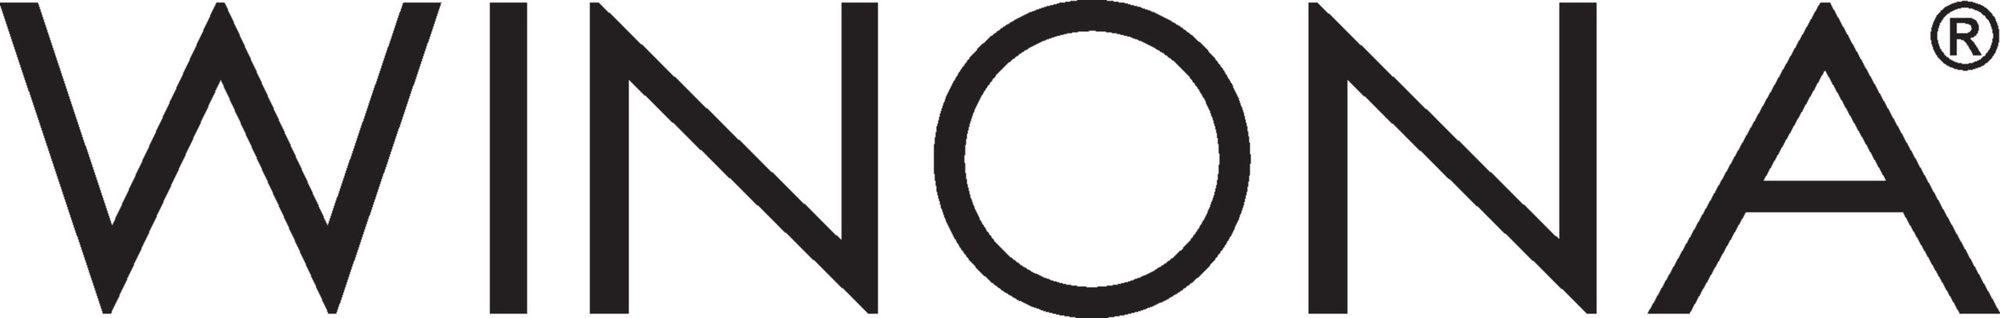 Winona Logo - An Acuity Brands Co.